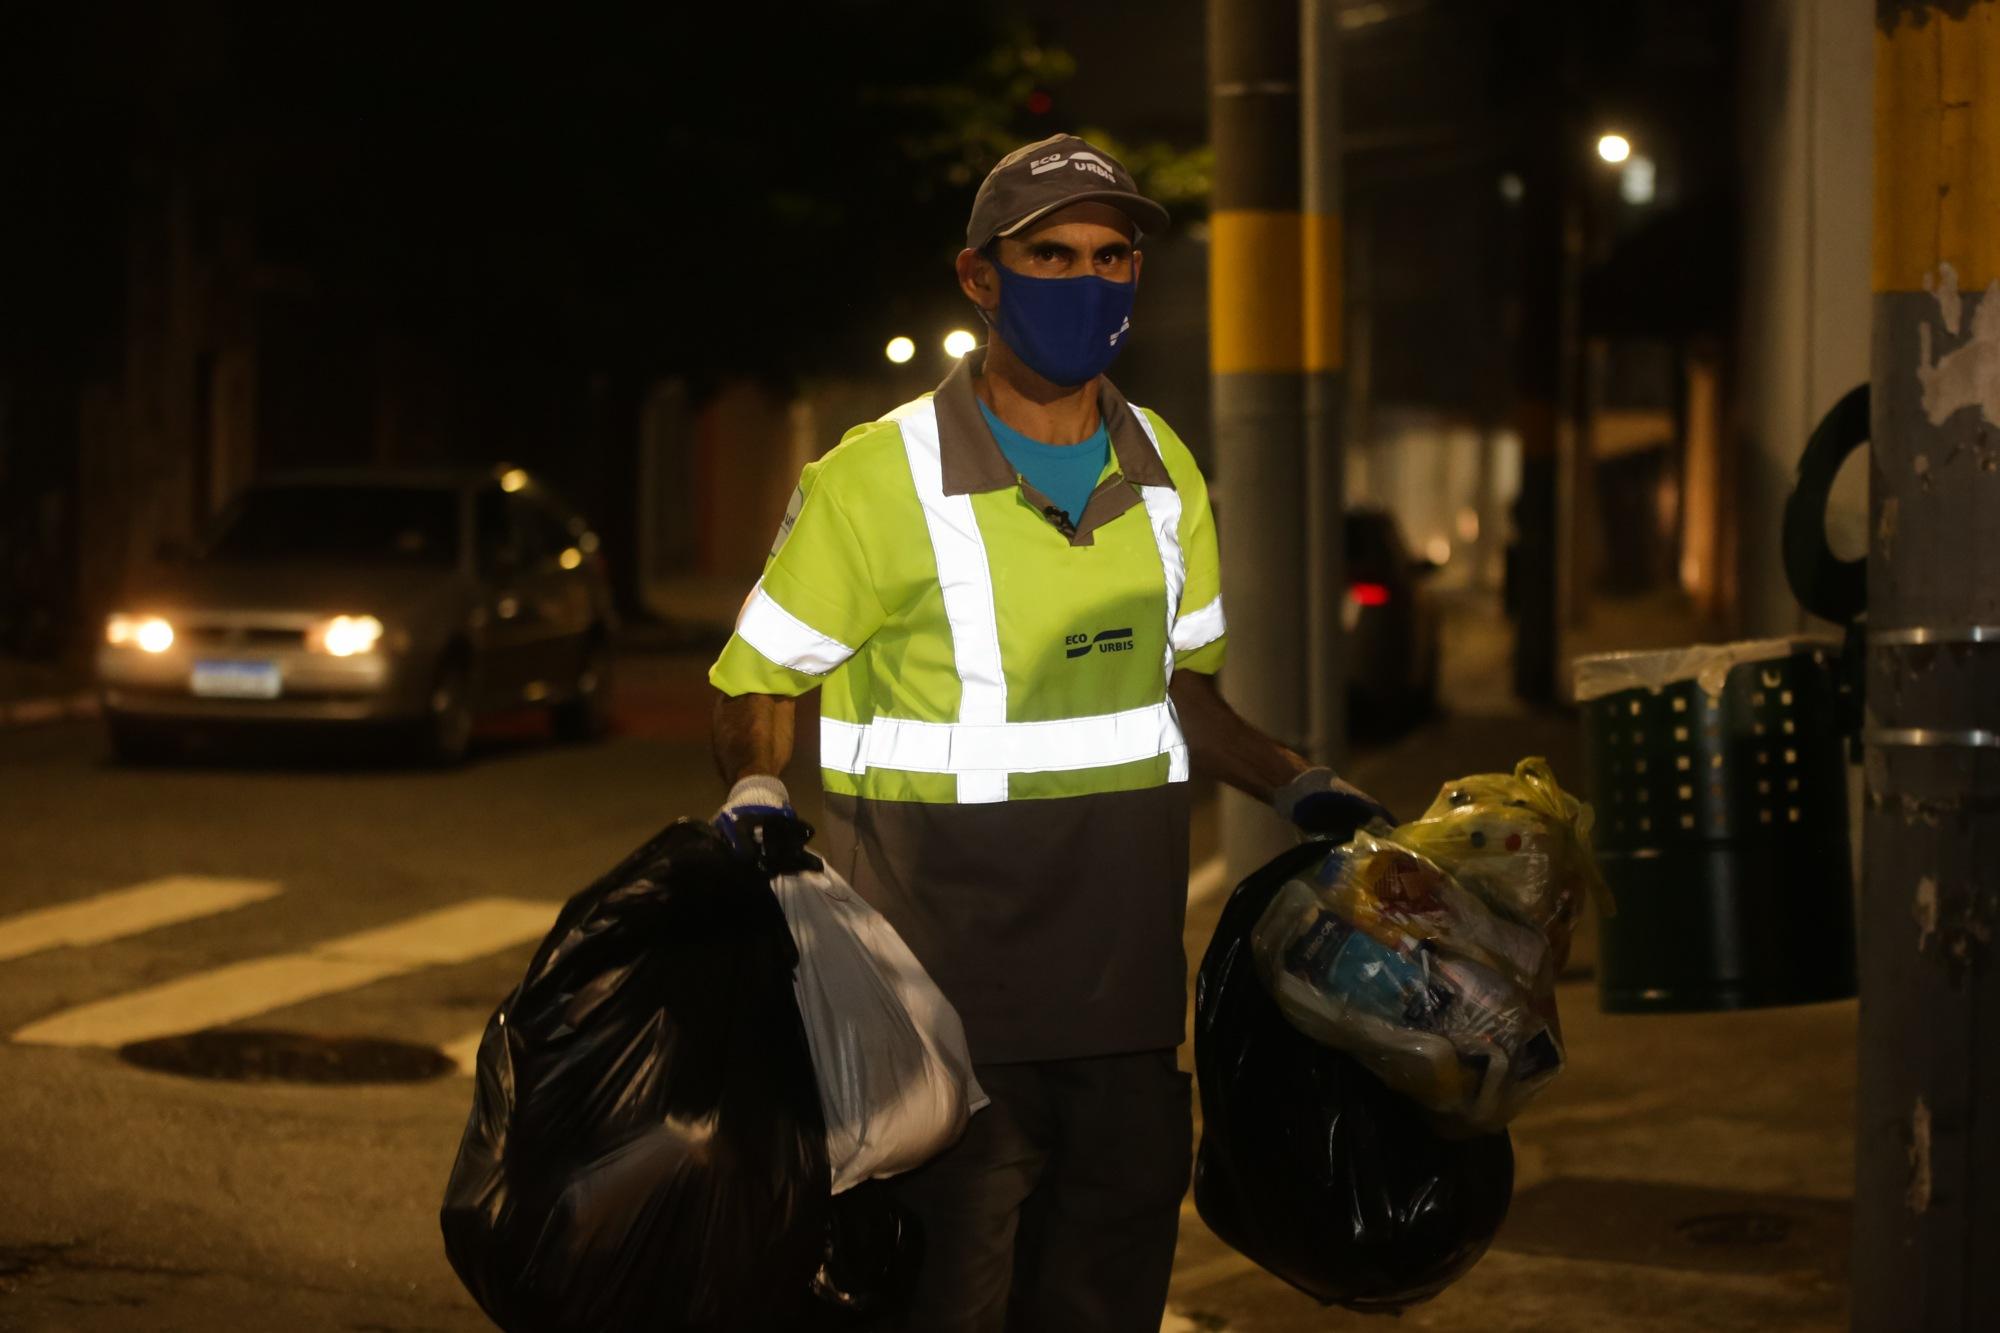 coletores de lixo-2847 -26